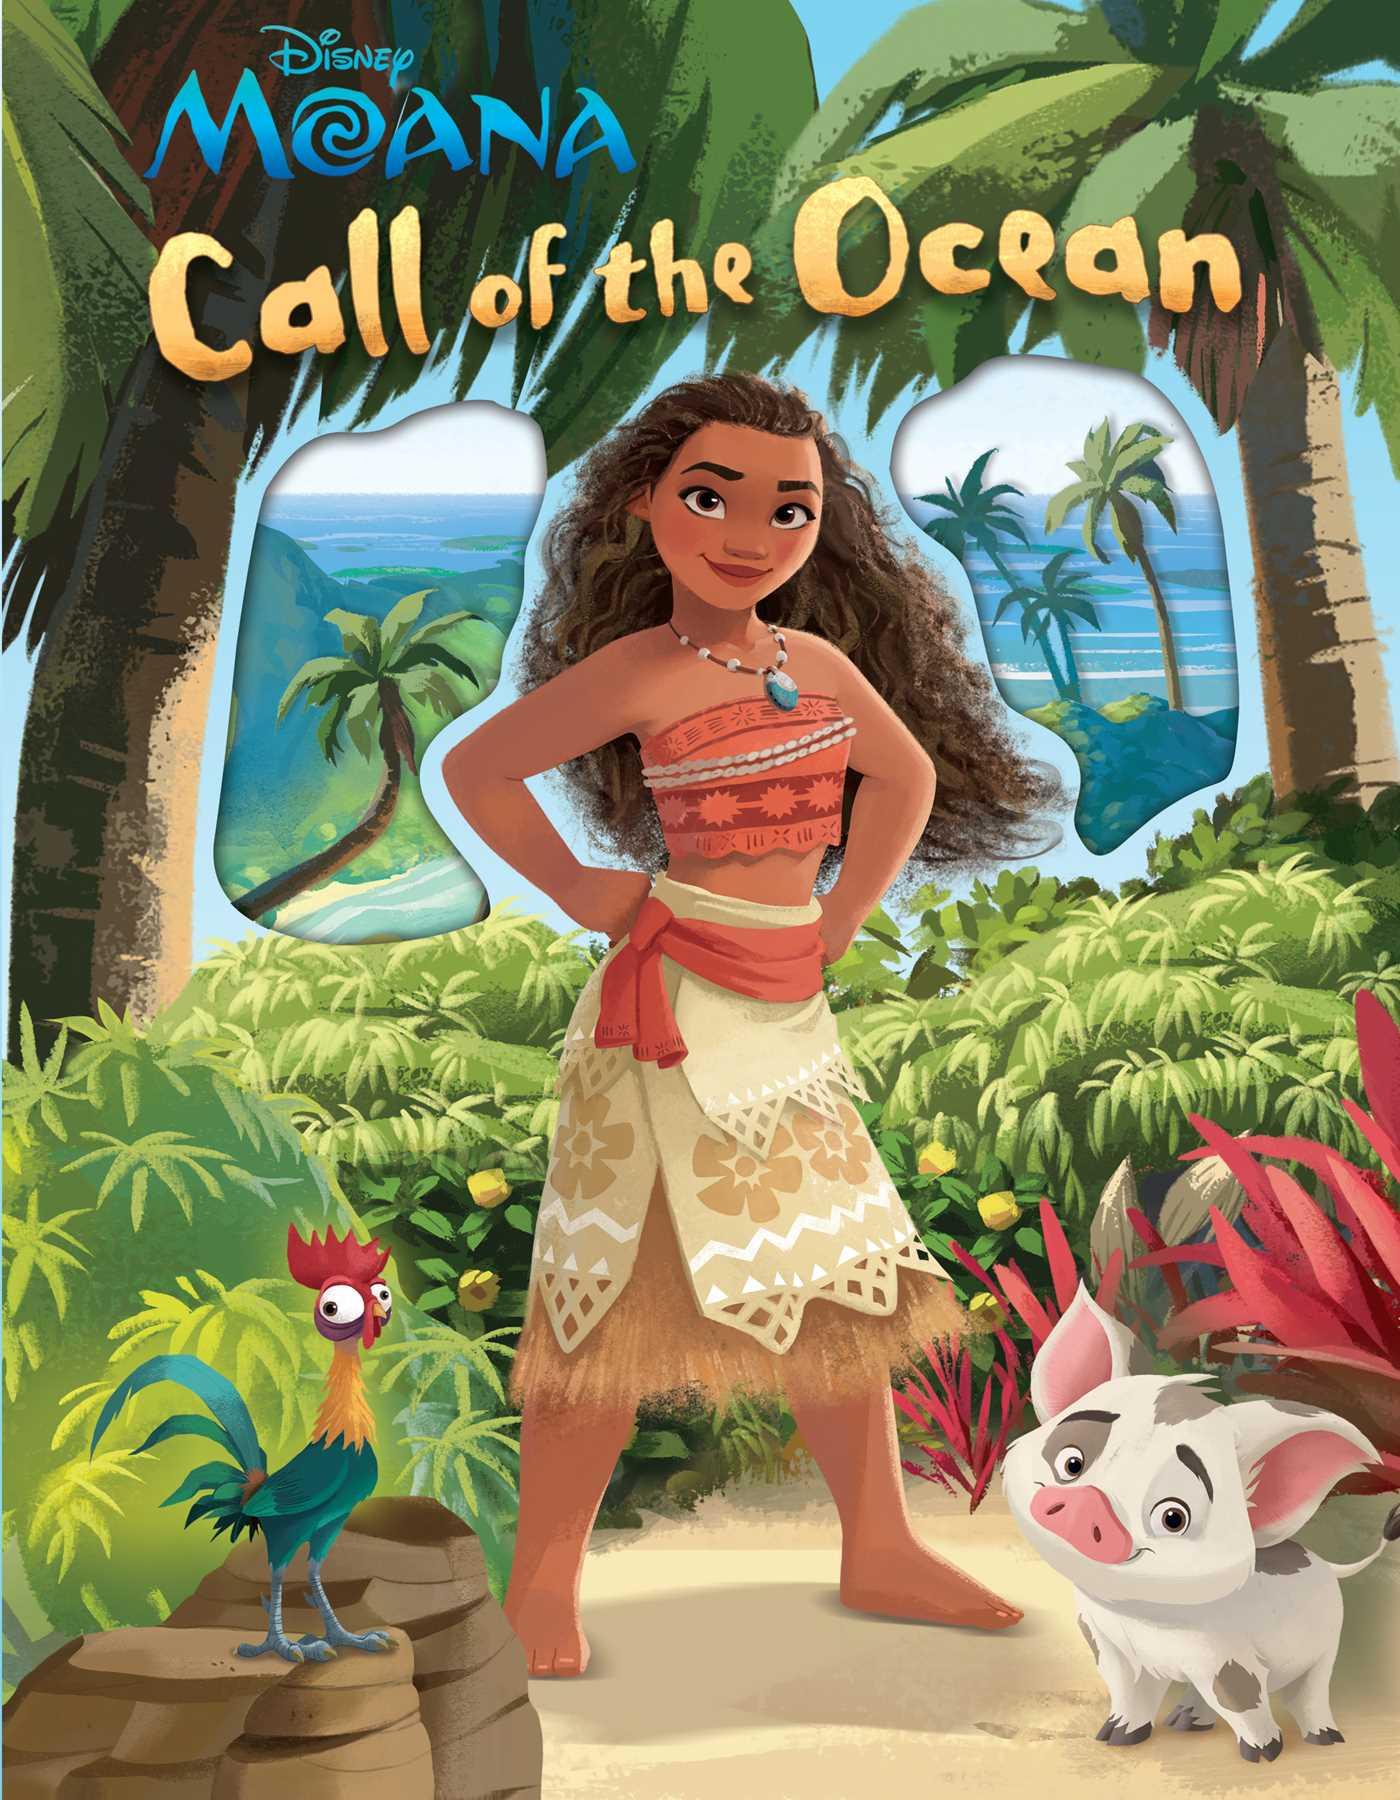 Disney Moana: Call of the Ocean